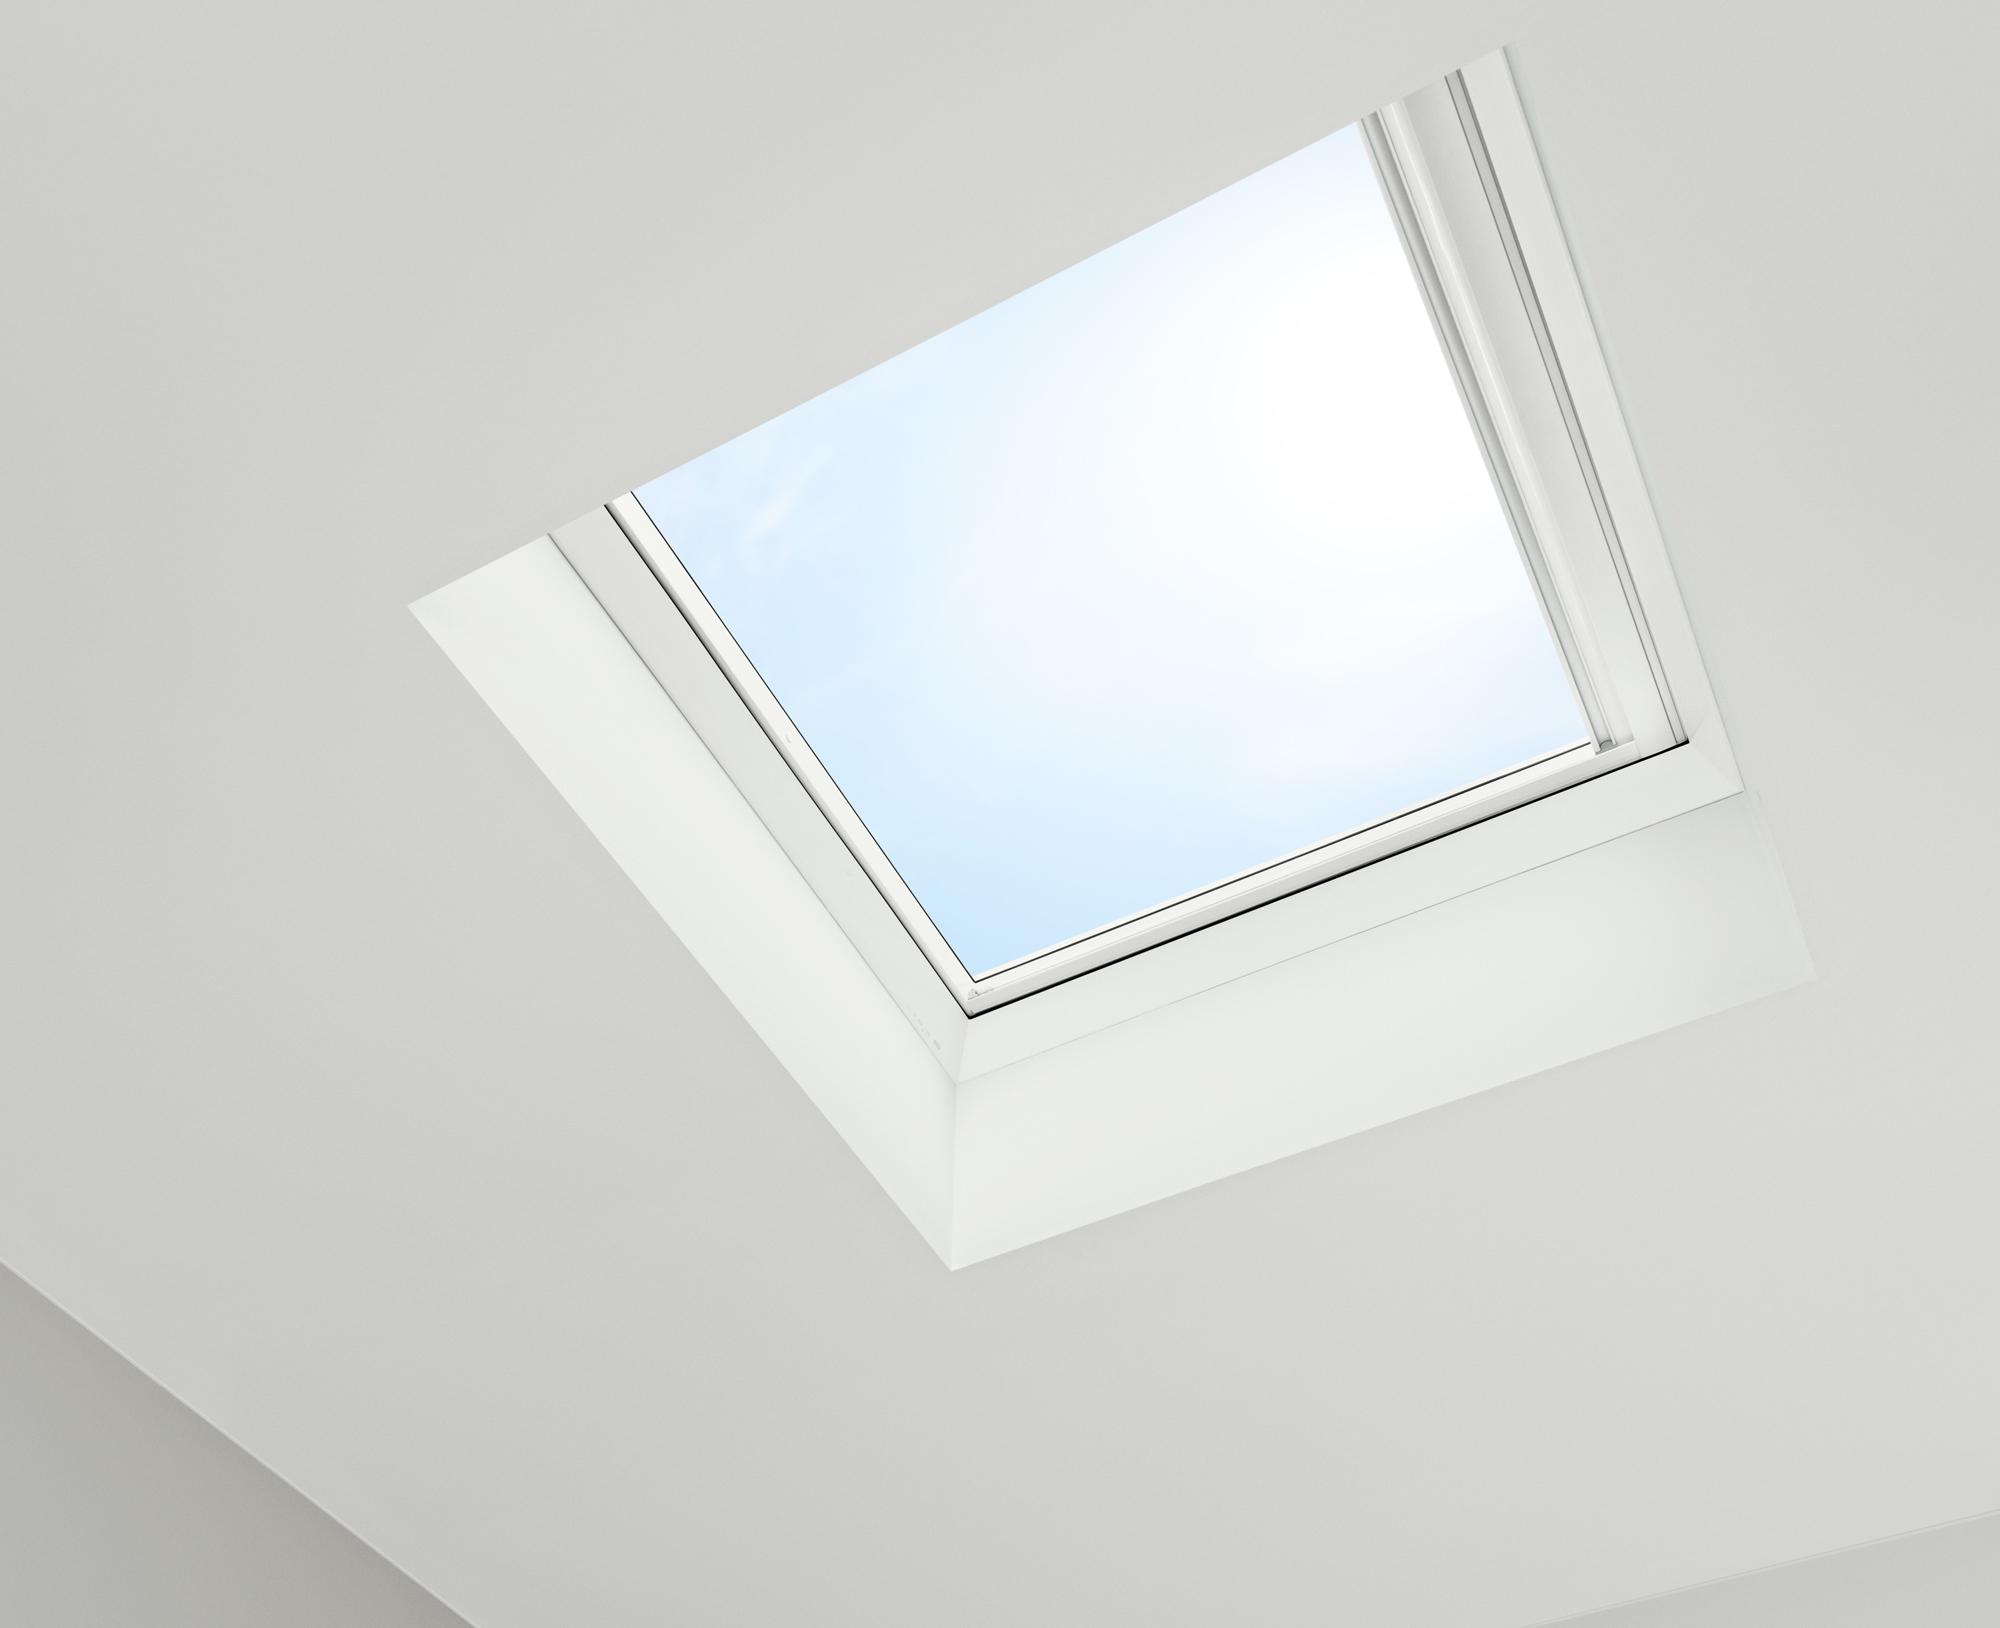 Finestra bassoemissiva velux - Quanto costa una finestra velux ...